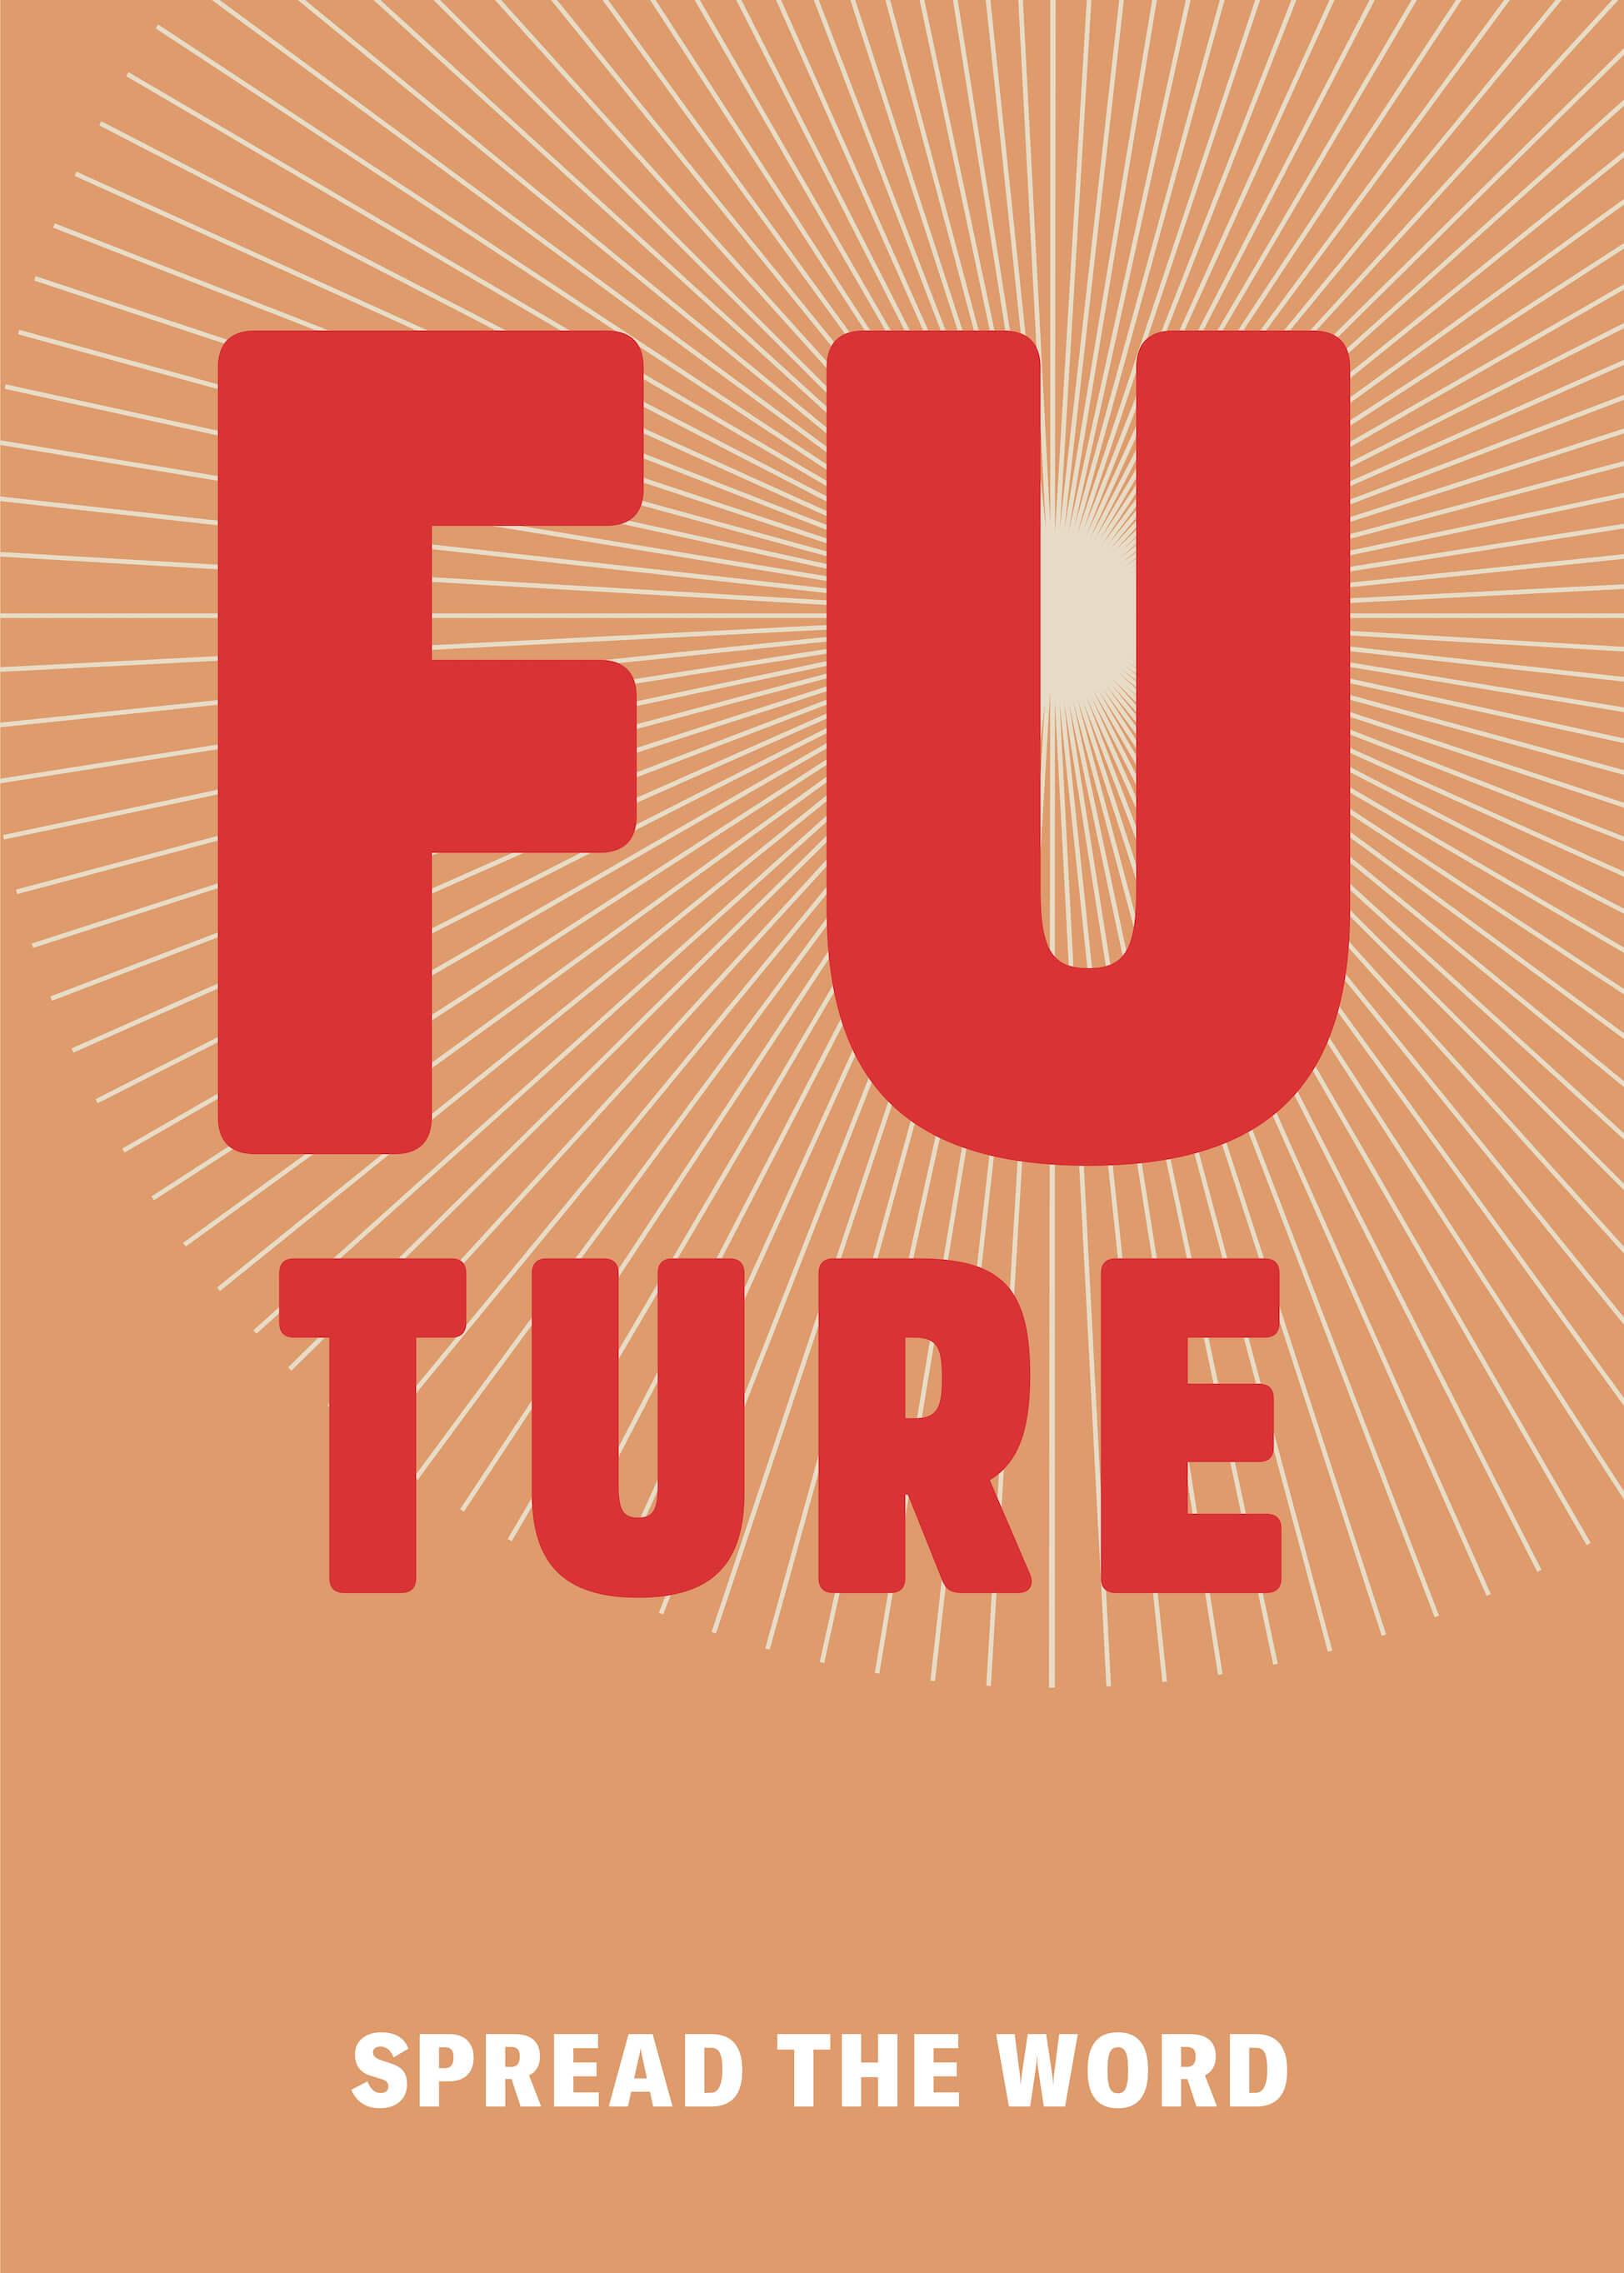 Spread The Word - Future main image